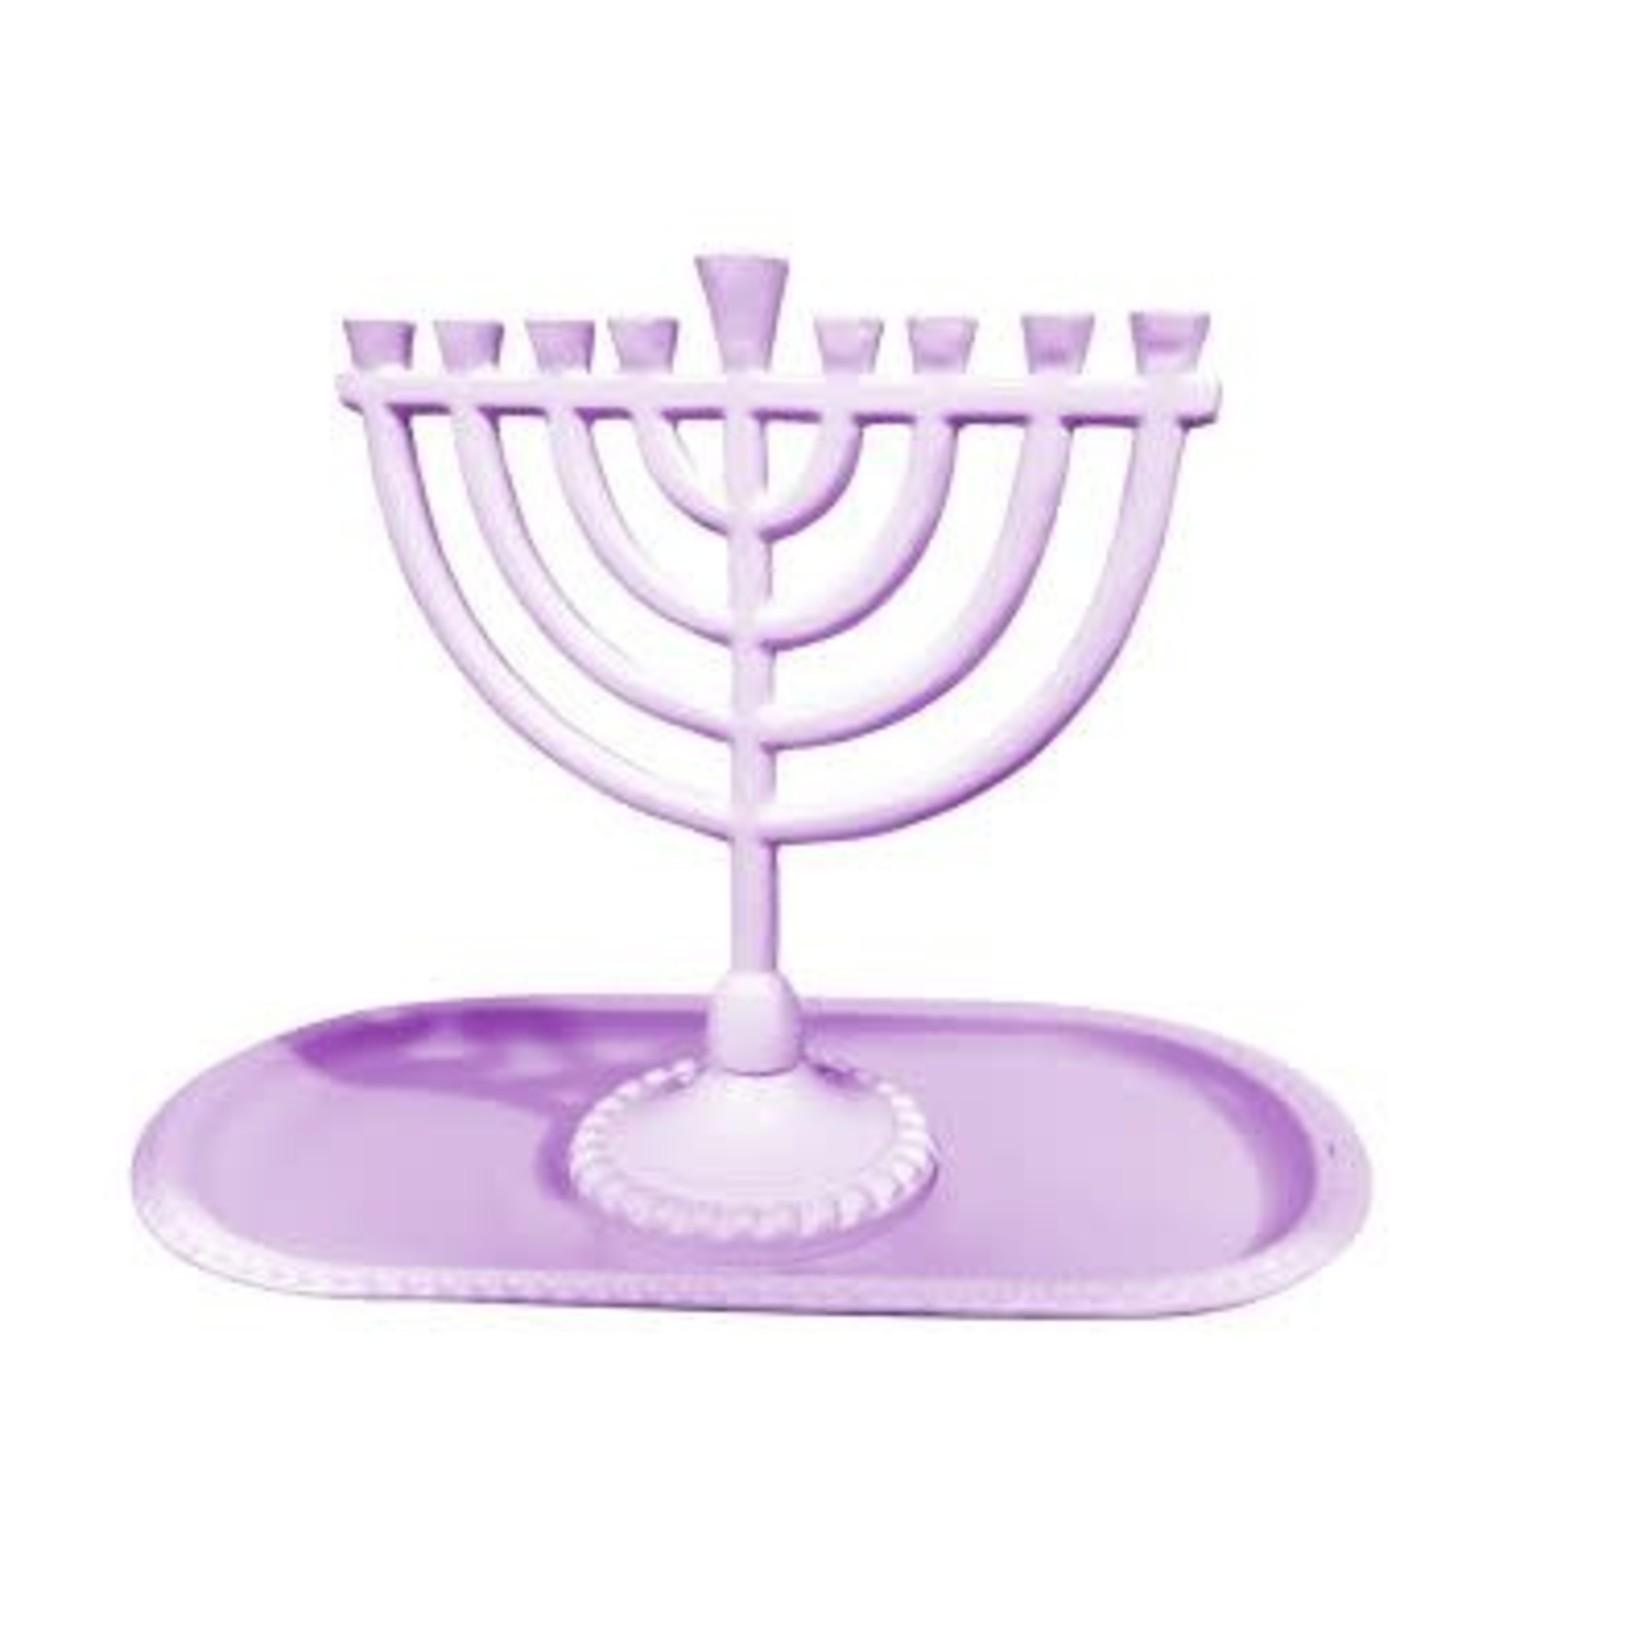 "59058 Mini menroah And Tray Set Menorah 6x6.5"" Round Style Light Purple"